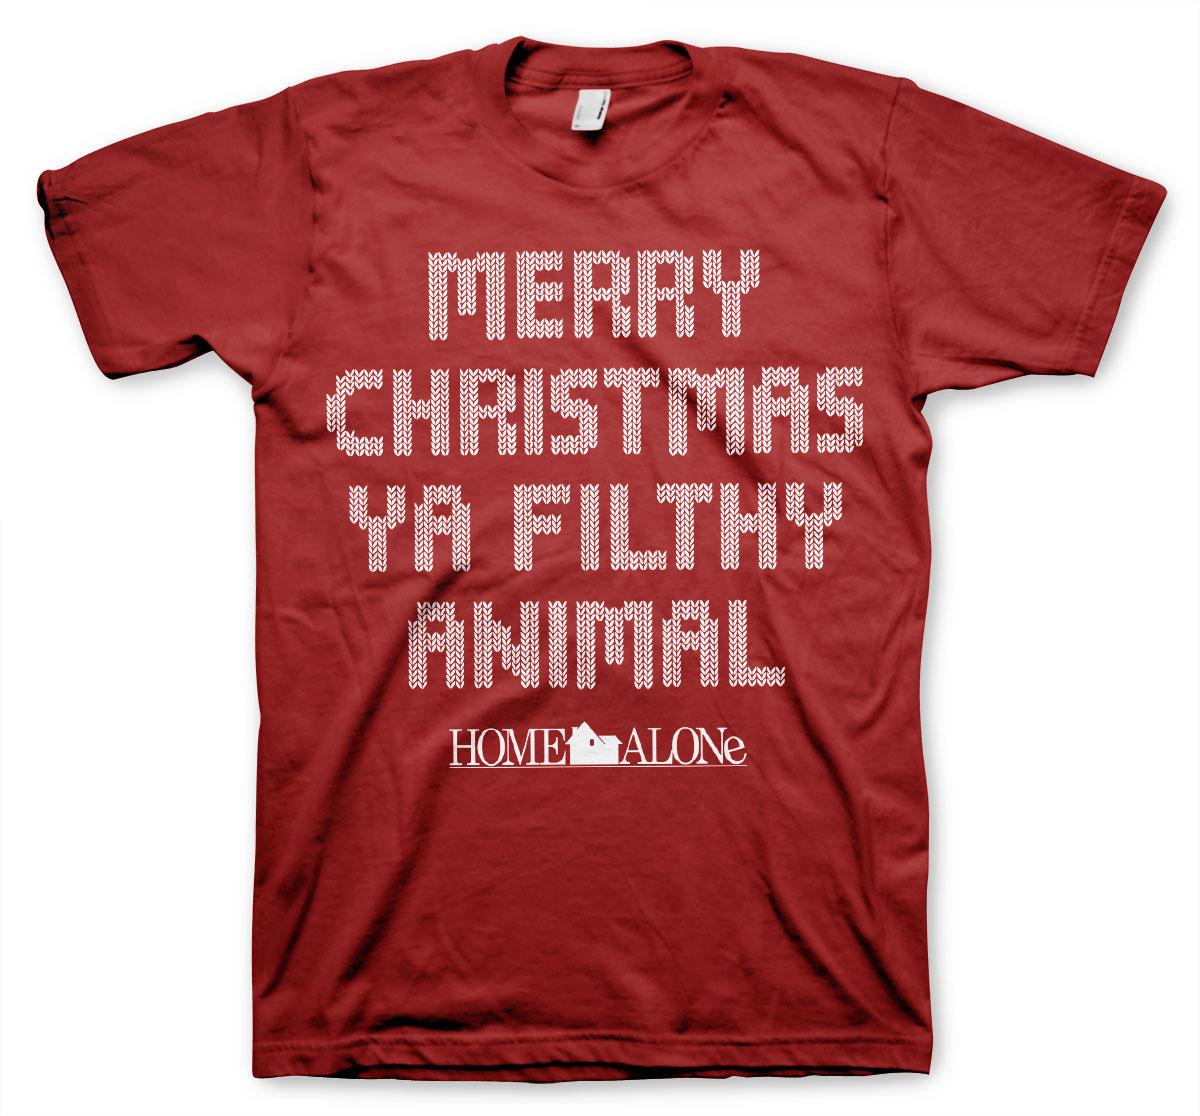 Alene_hjemme_merry-x-mas_t-shirt